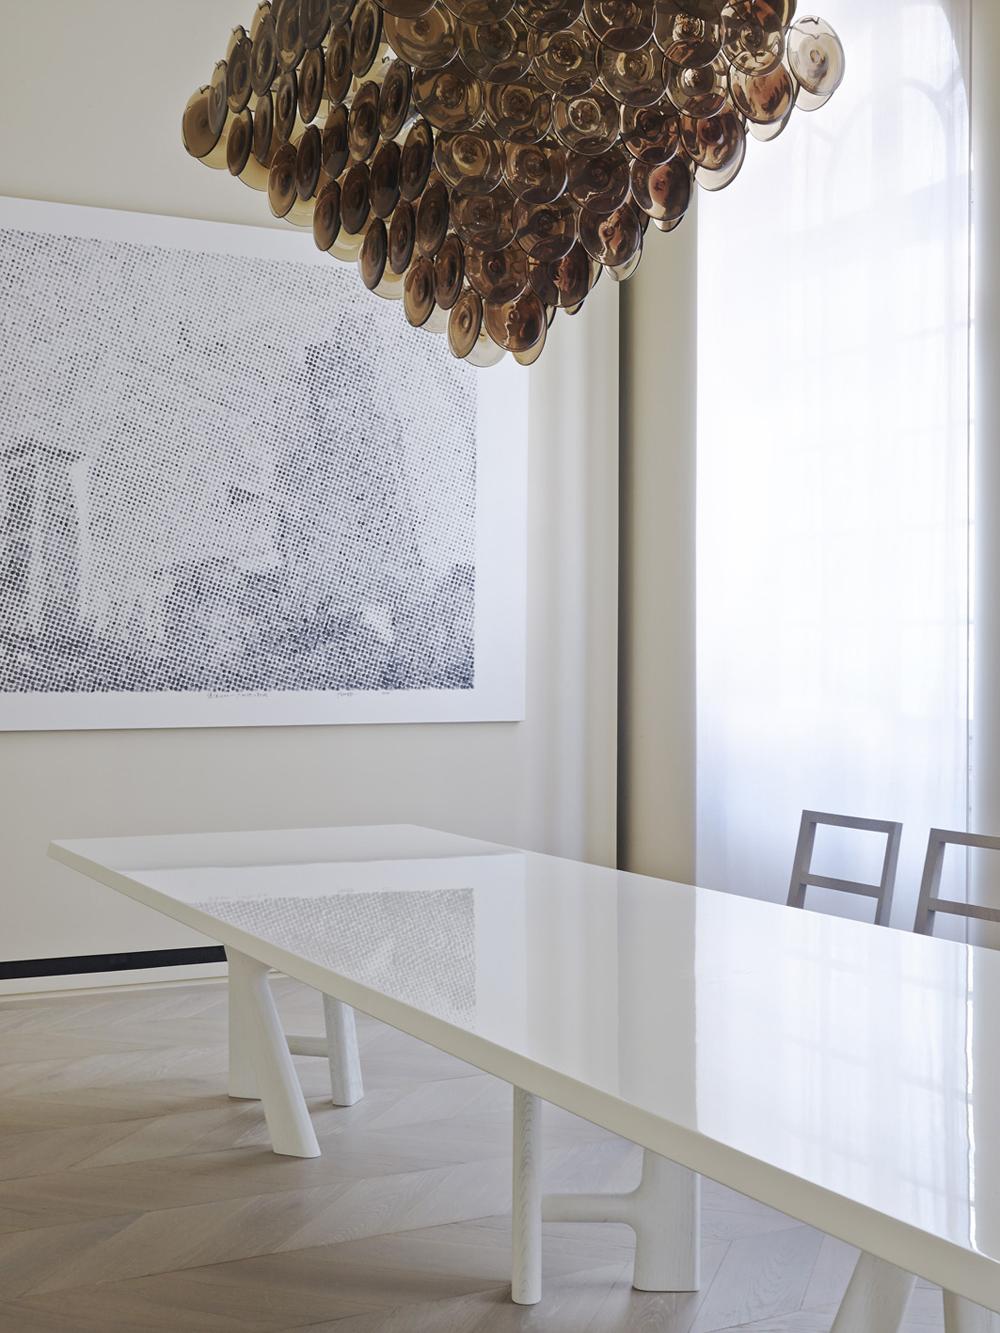 christophe-delcourt-interior-inspiration-2.jpg